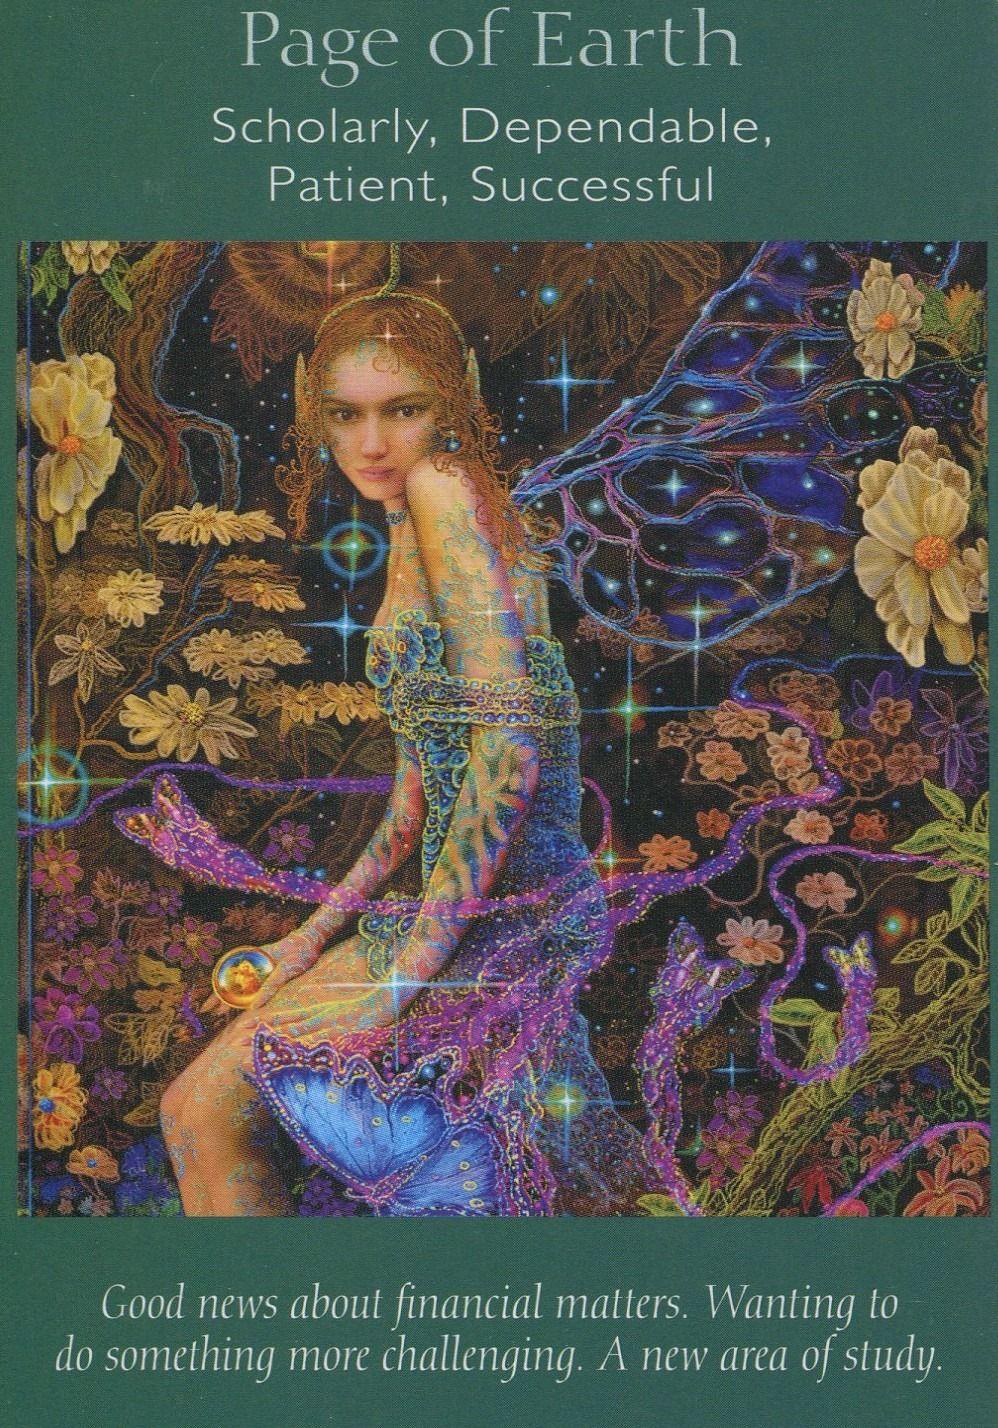 Page of Earth, Angel Tarot